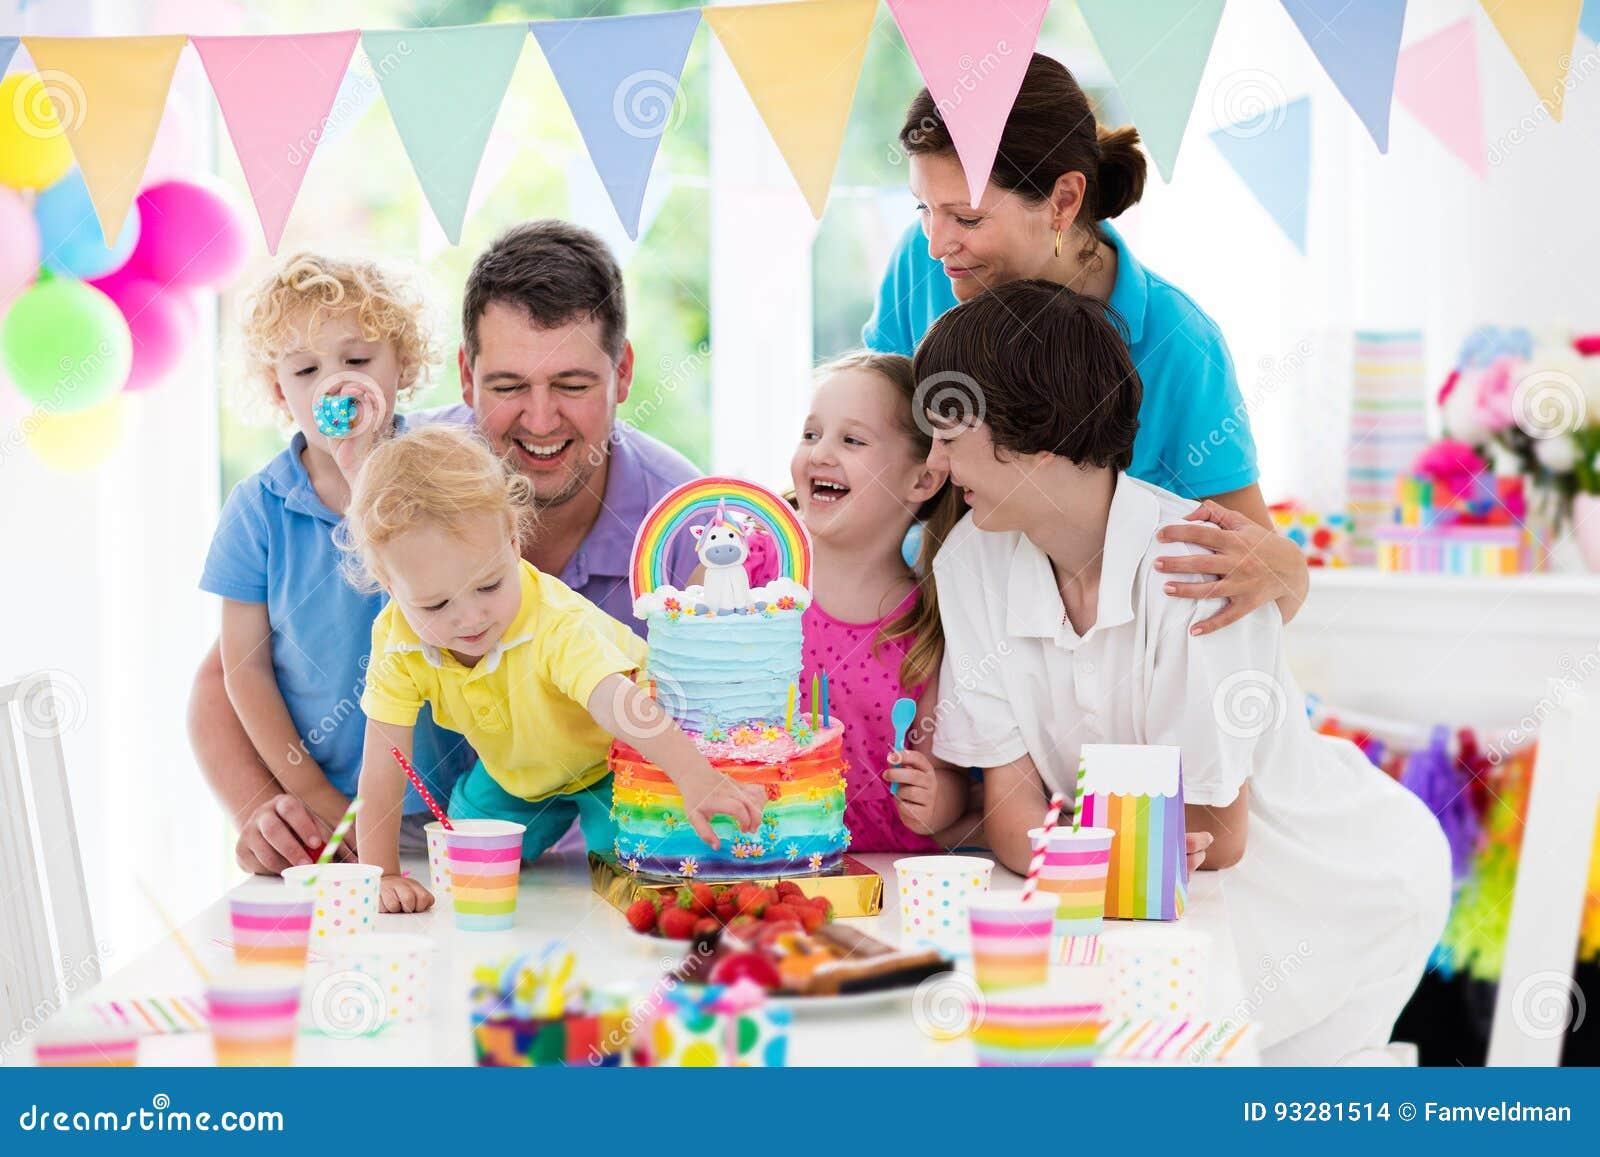 Kids Birthday Party Family Celebration With Cake Stock